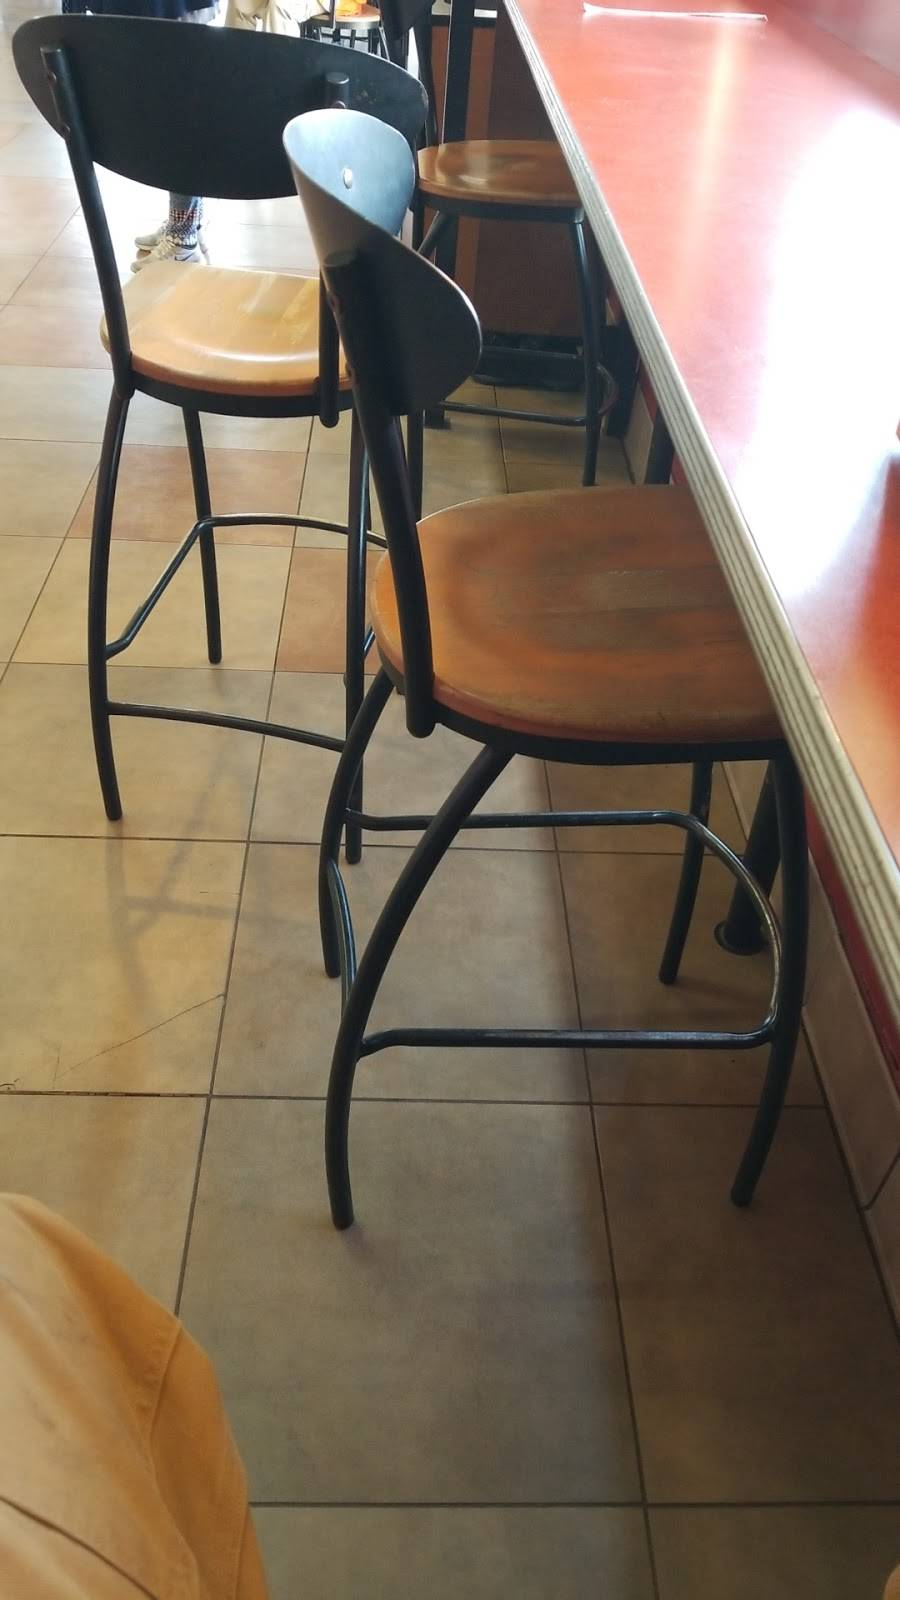 Jack in the Box | restaurant | 1720 W, CA-1, Long Beach, CA 90810, USA | 5624366850 OR +1 562-436-6850